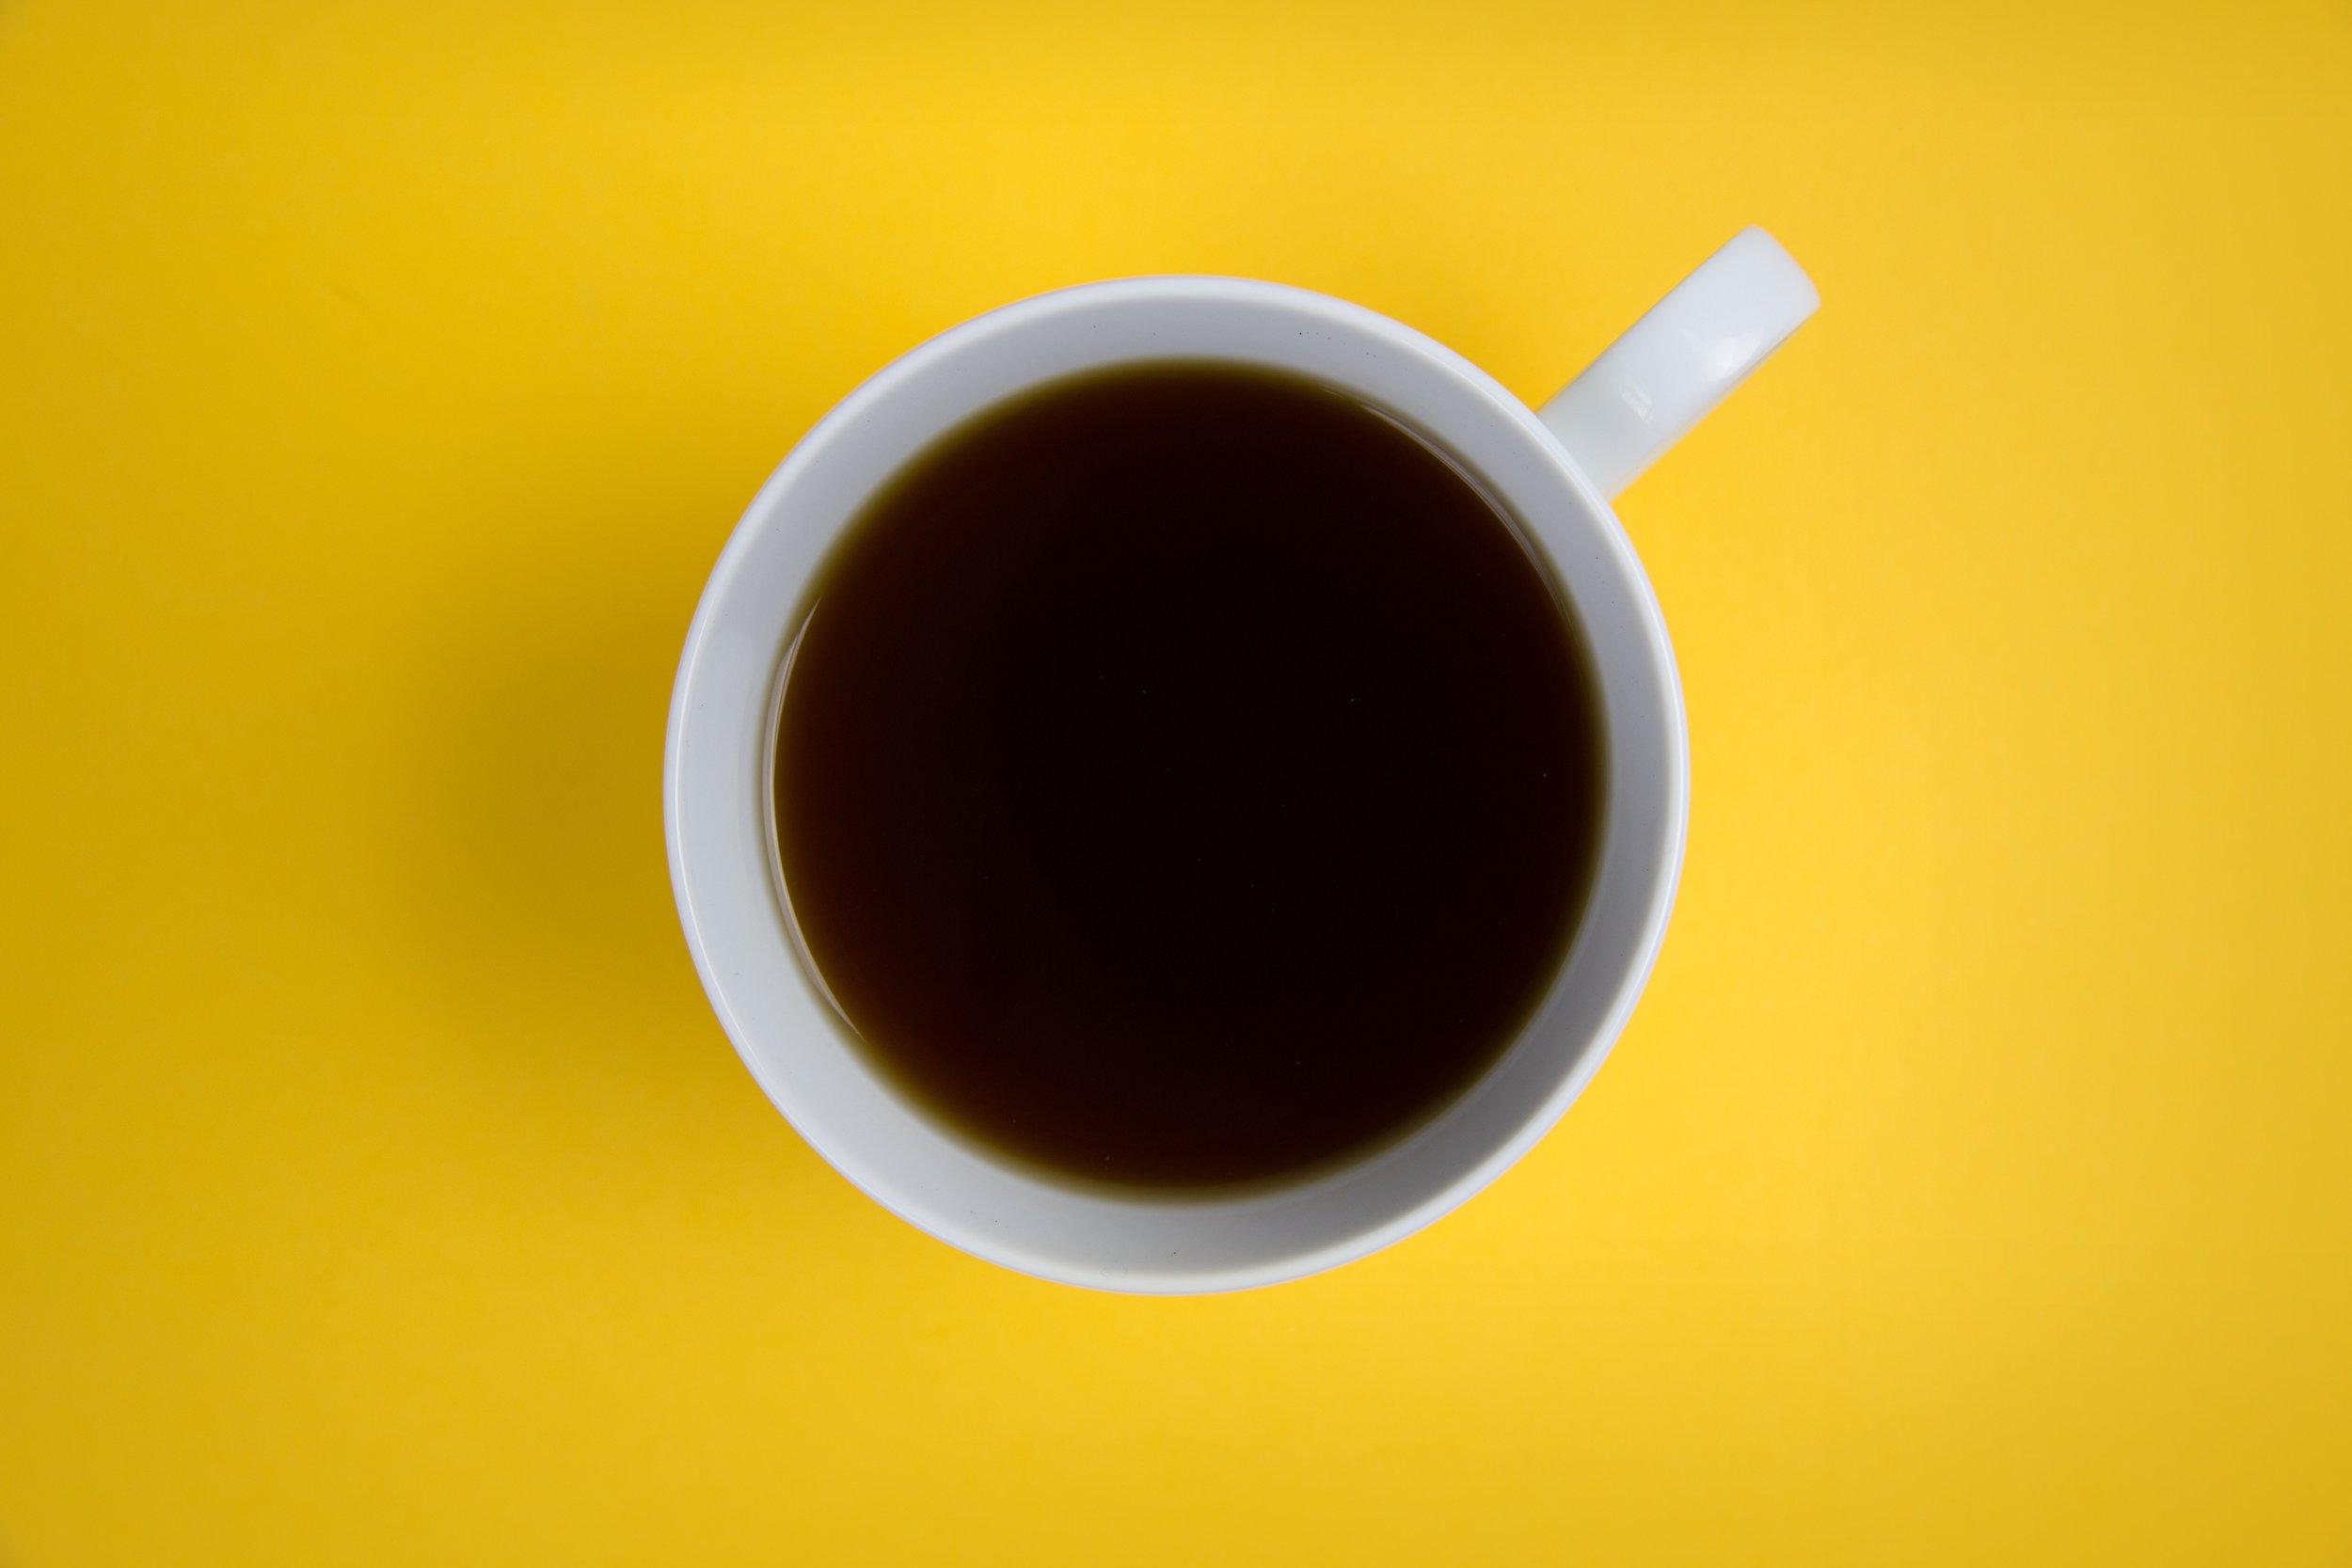 caffeine-close-up-coffee-539432.jpg